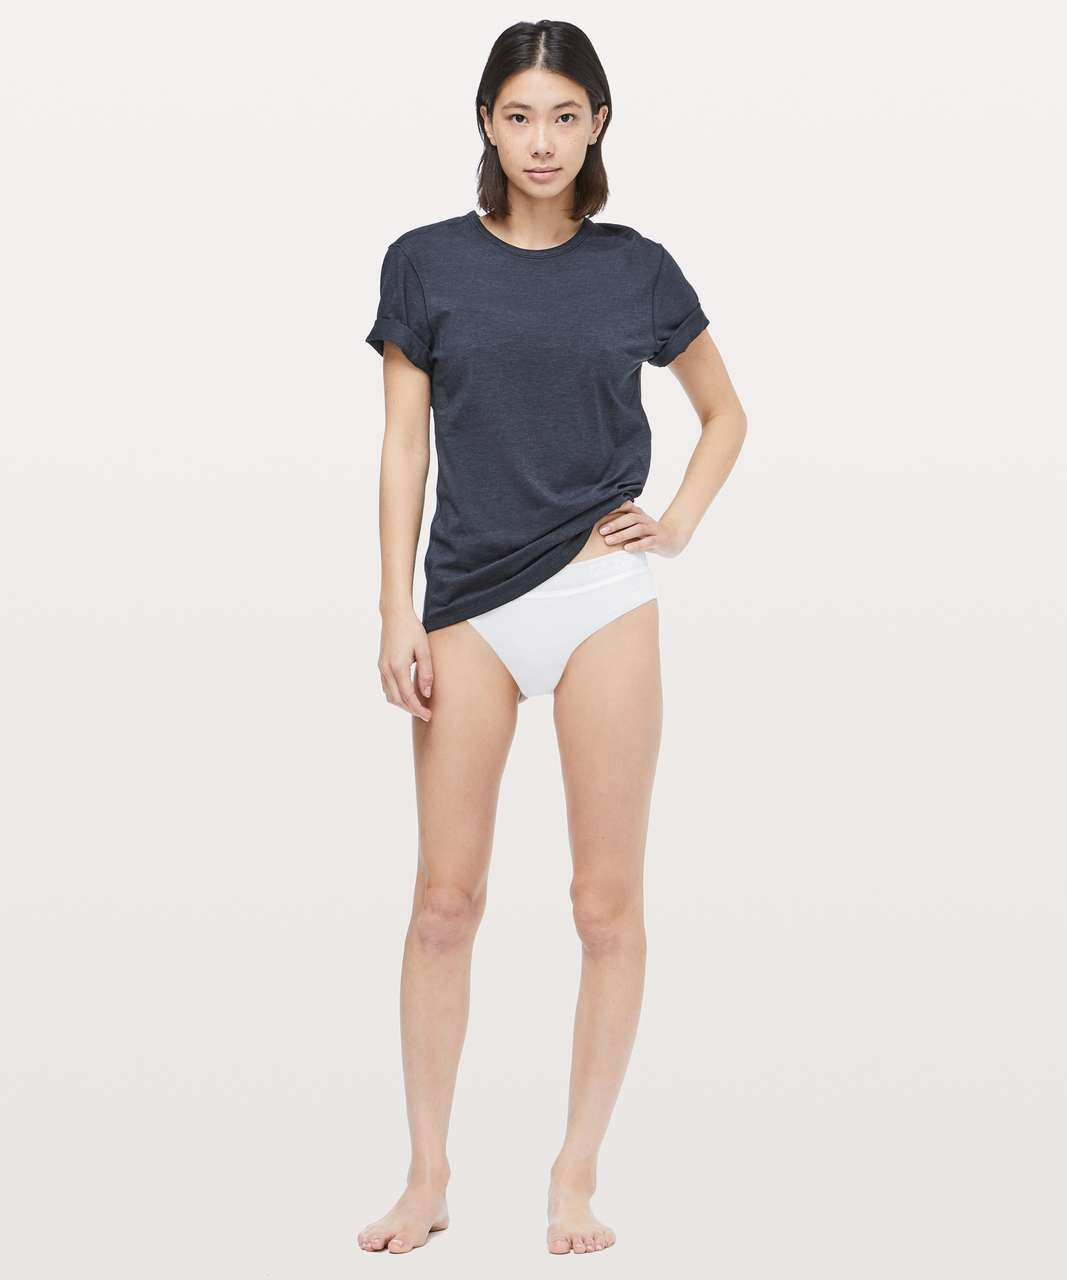 Lululemon Ever Essentials Bikini - White